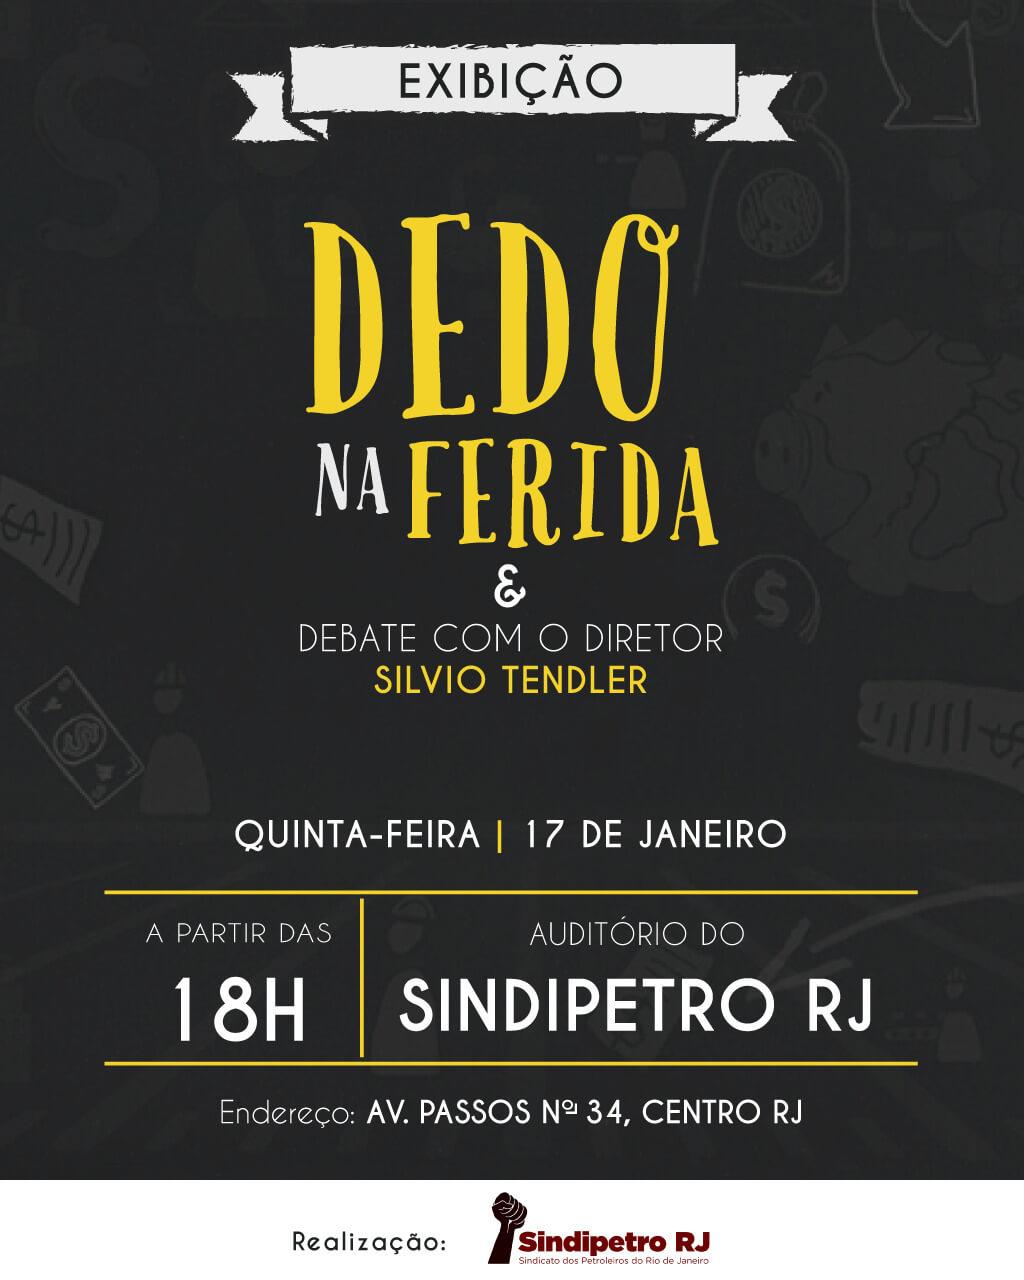 Sindipetro-RJ exibe novo documentário de Silvio Tendler WhatsApp Image 2018 12 28 at 08